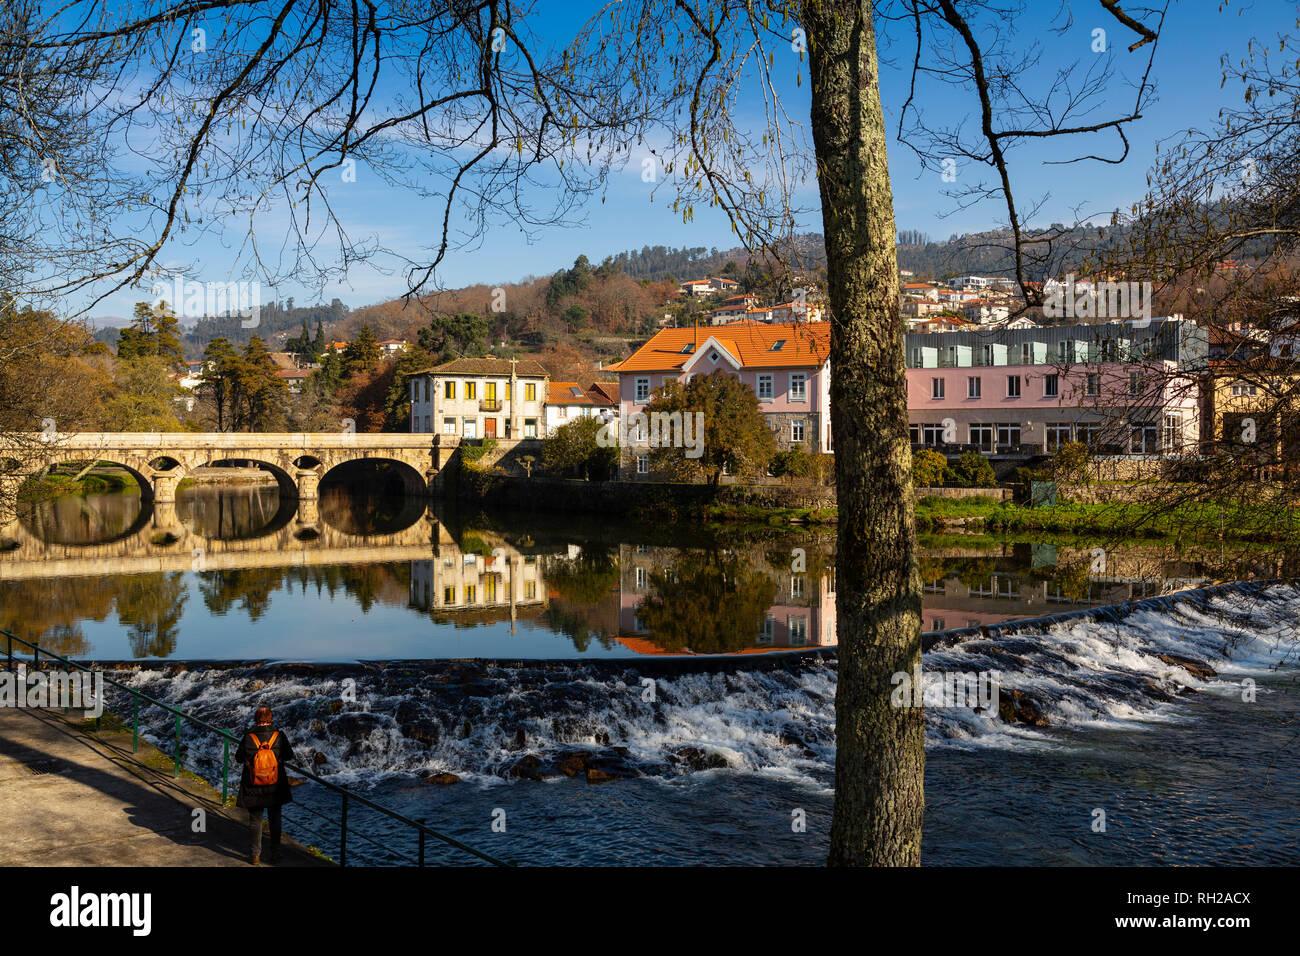 Ancient bridge, Vez river and village of Arcos de Valdevez. Viana do Castelo, Alto Minho region. Northern Portugal, Europe - Stock Image